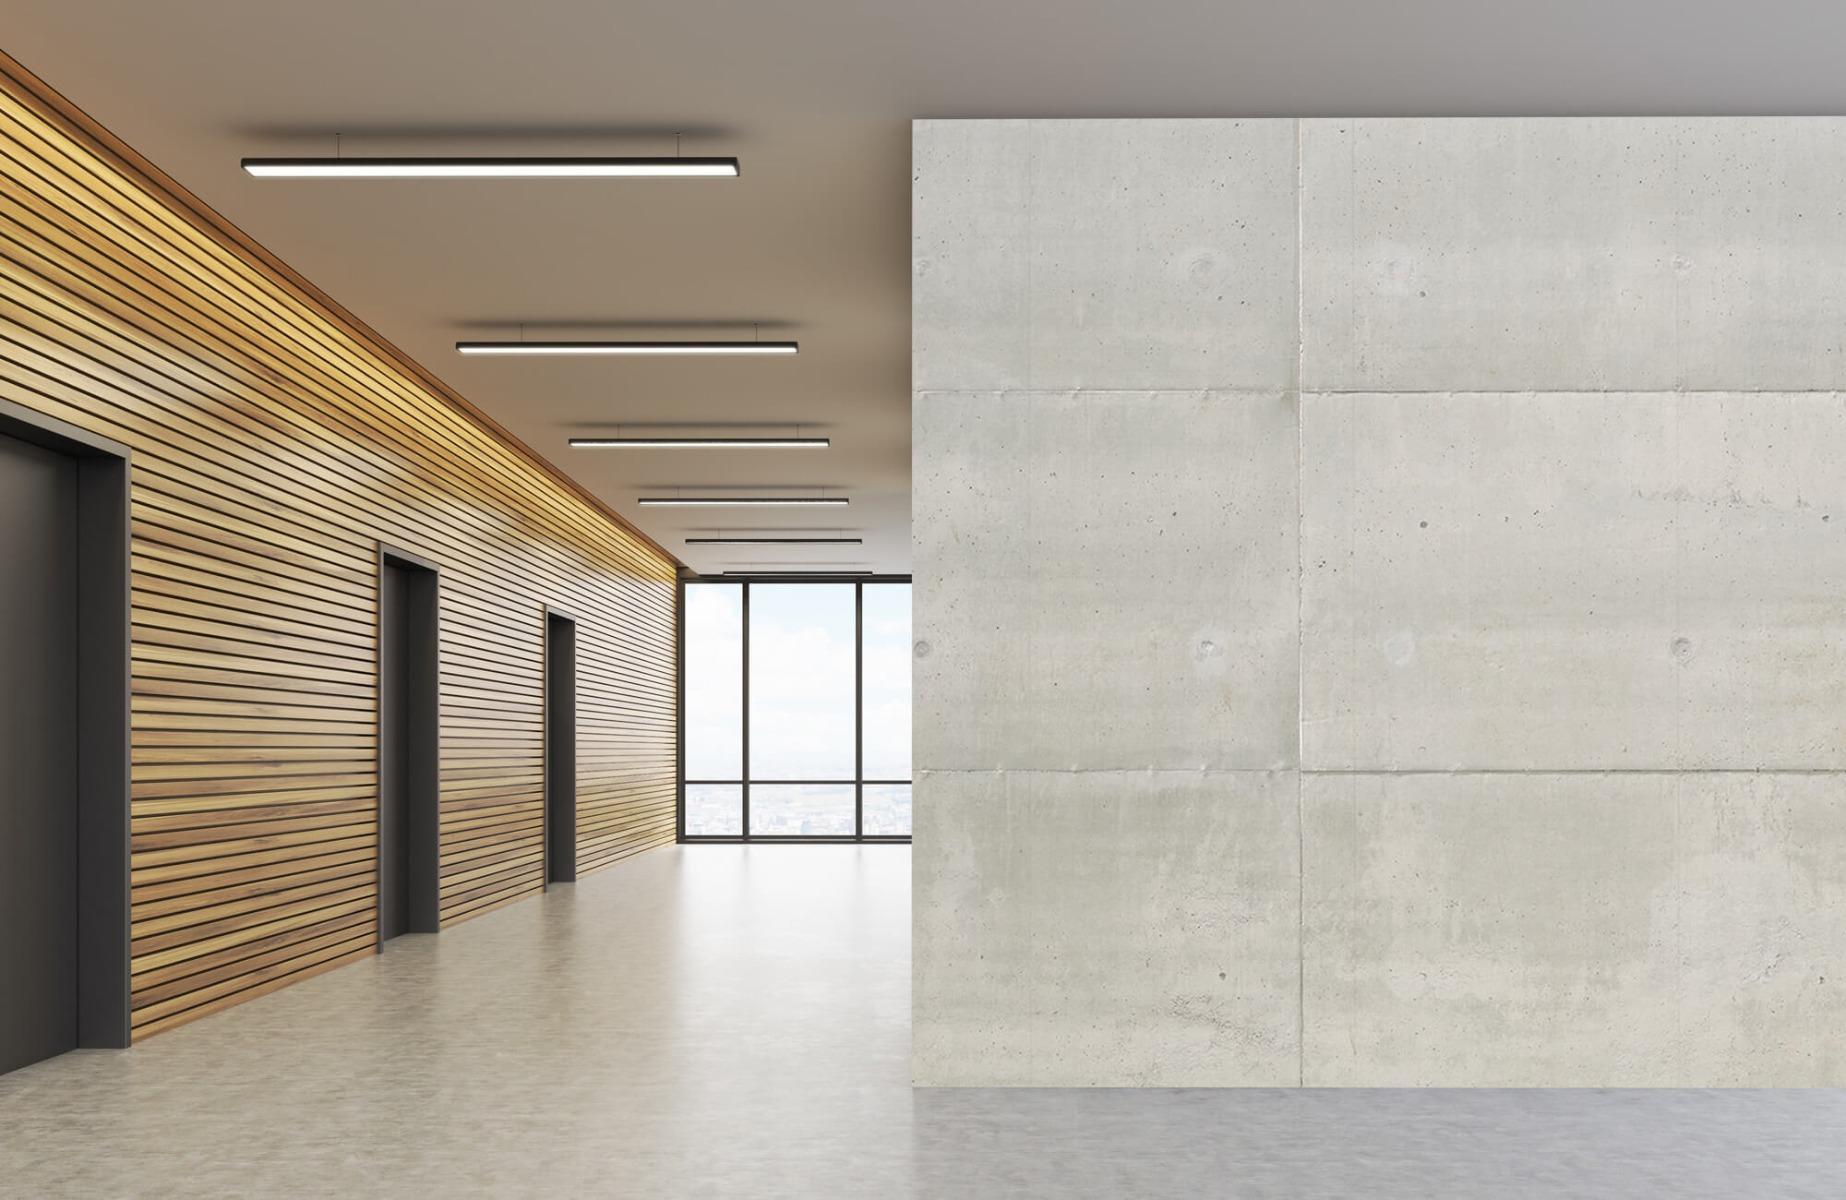 Betonlook behang - Betonnen platen - Wallexclusive - Vergaderruimte 4